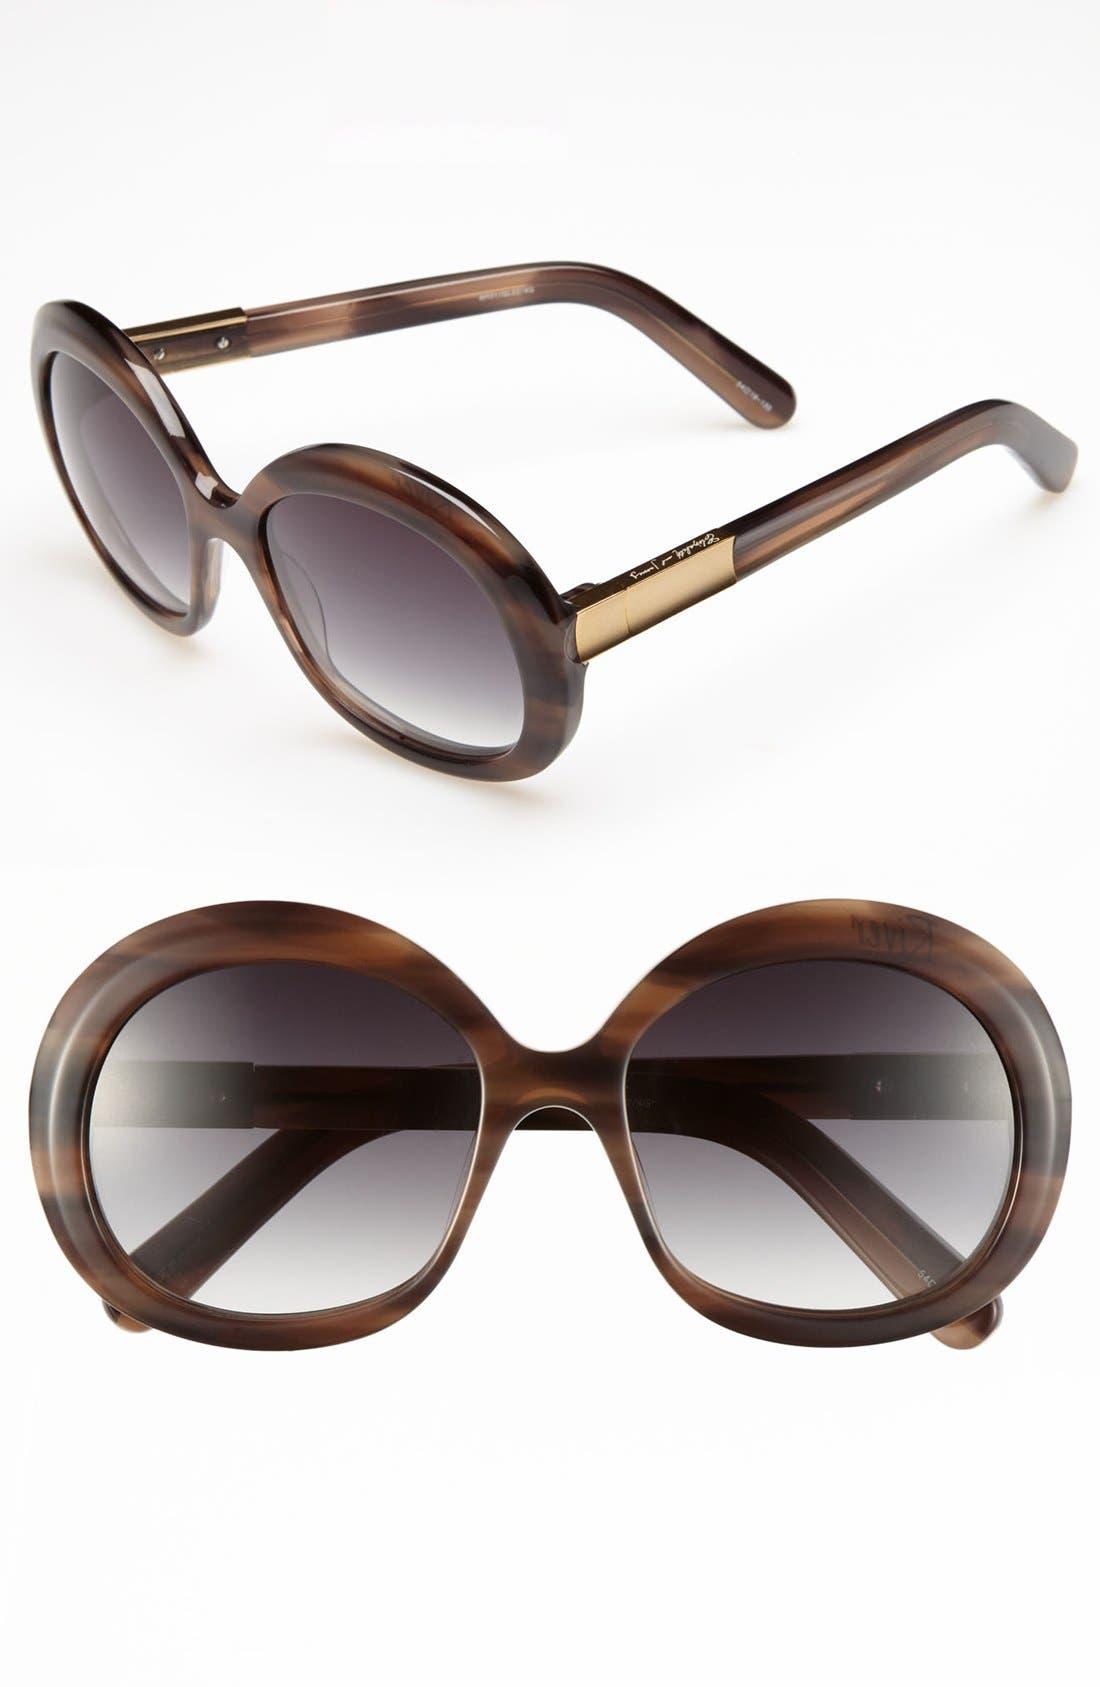 Main Image - Elizabeth and James 'River' 54mm Sunglasses